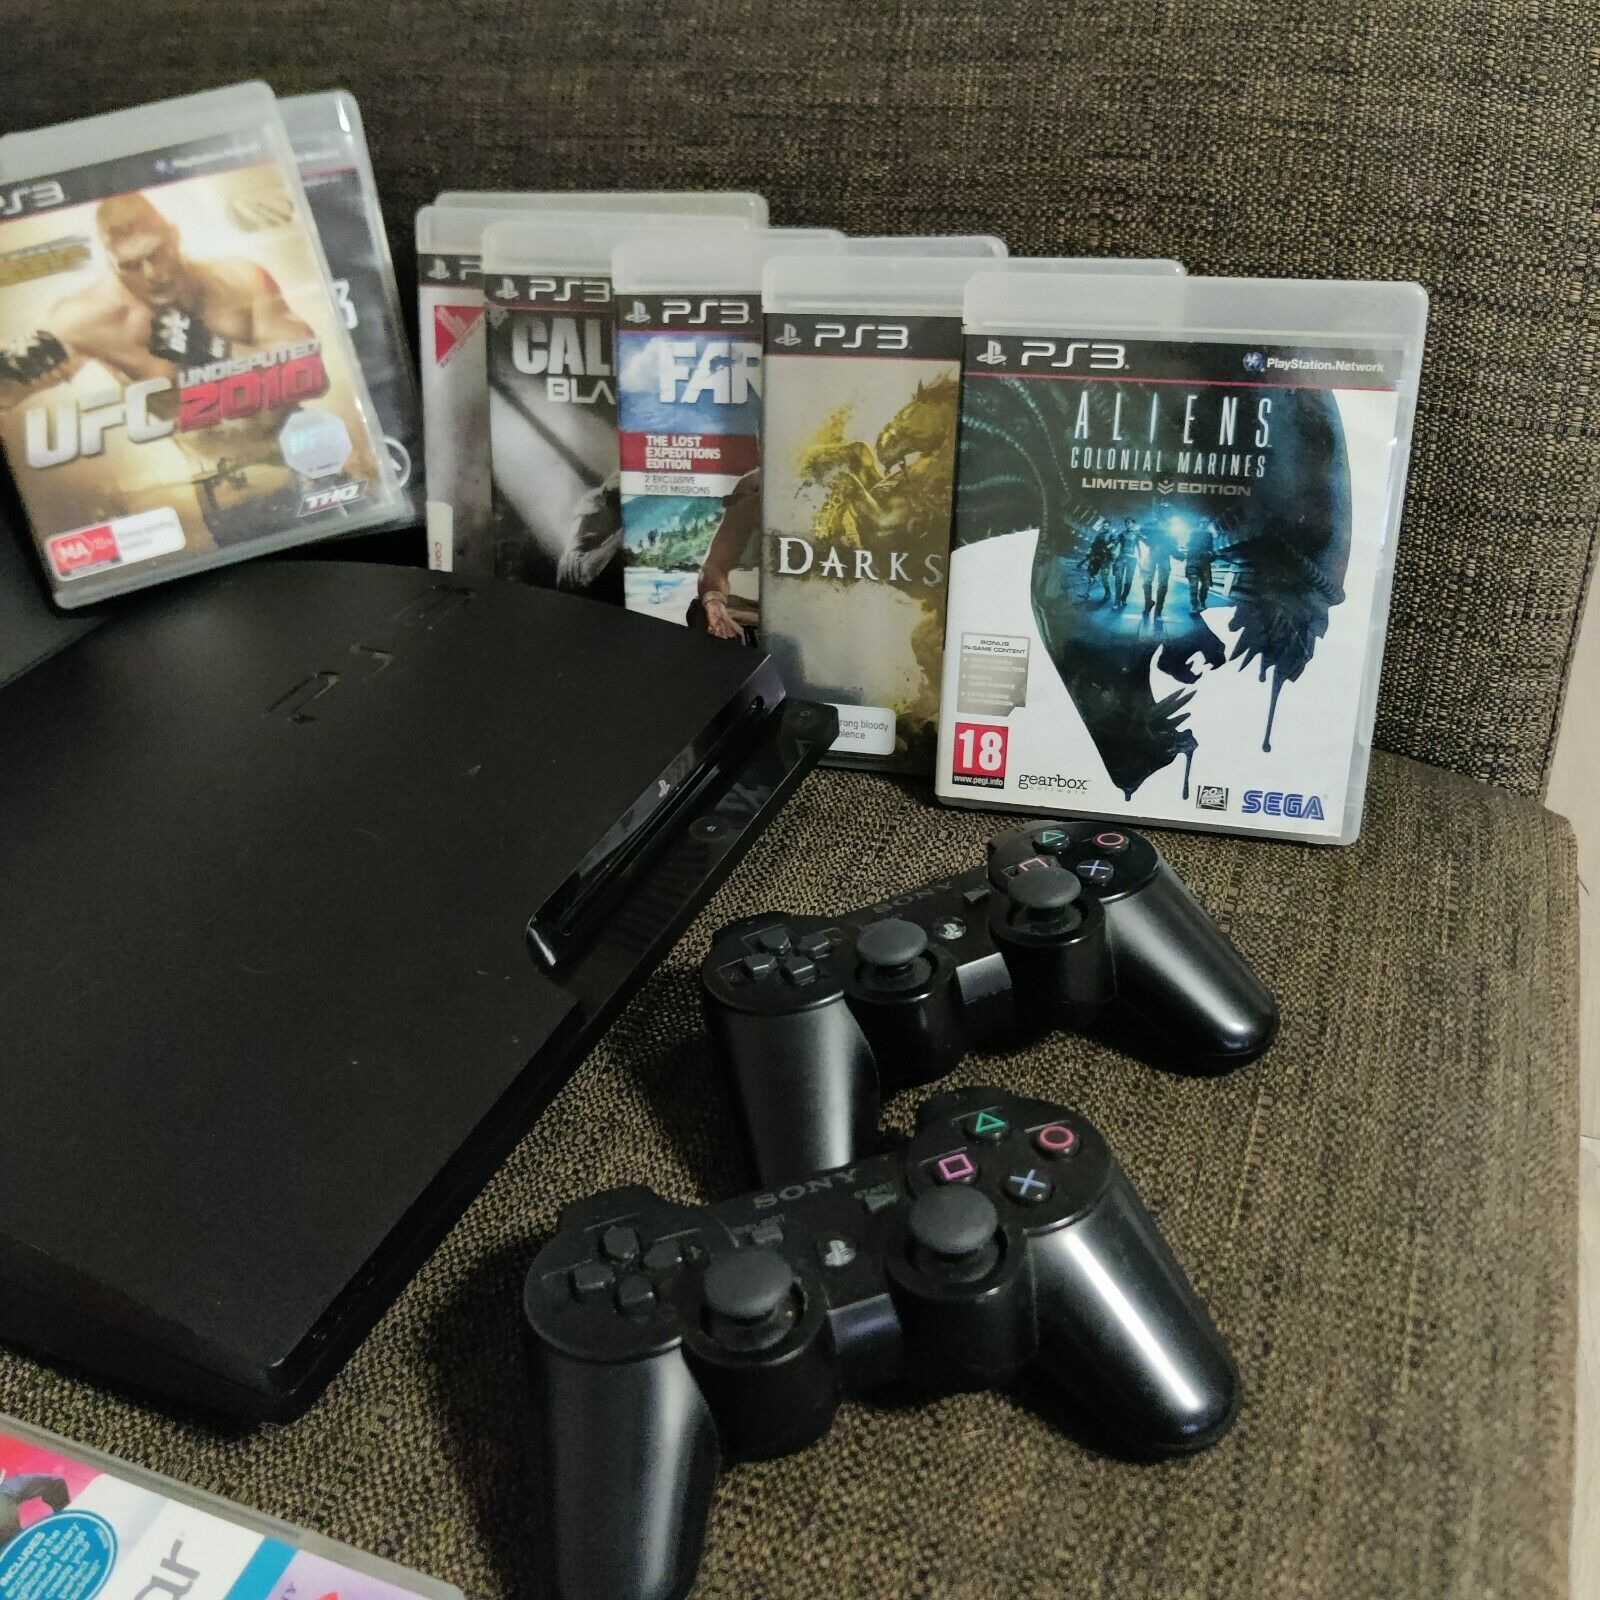 PS3 slim + original HORI V3 Stick, Controllers, games, udraw tablet, microphone